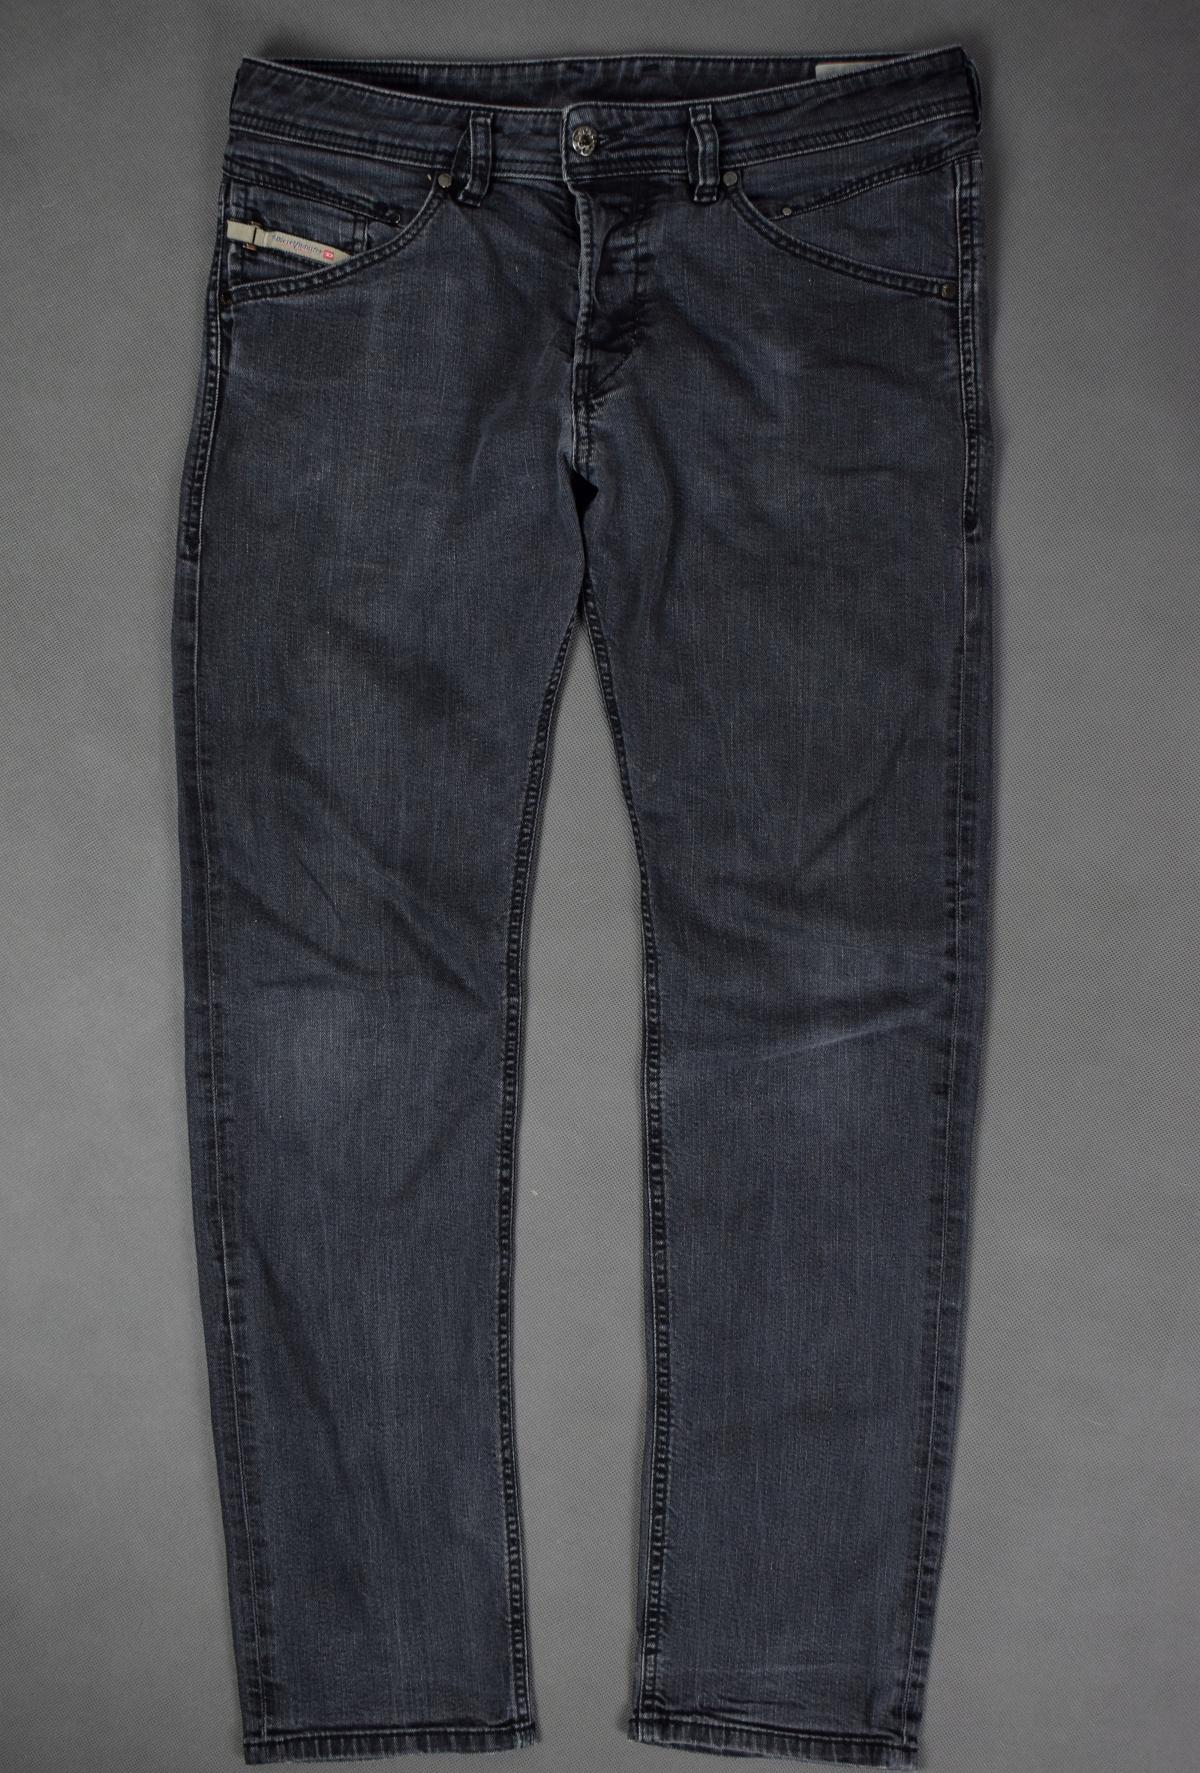 Diesel Belther Spodnie Jeansowe Slim Tapered 31/32